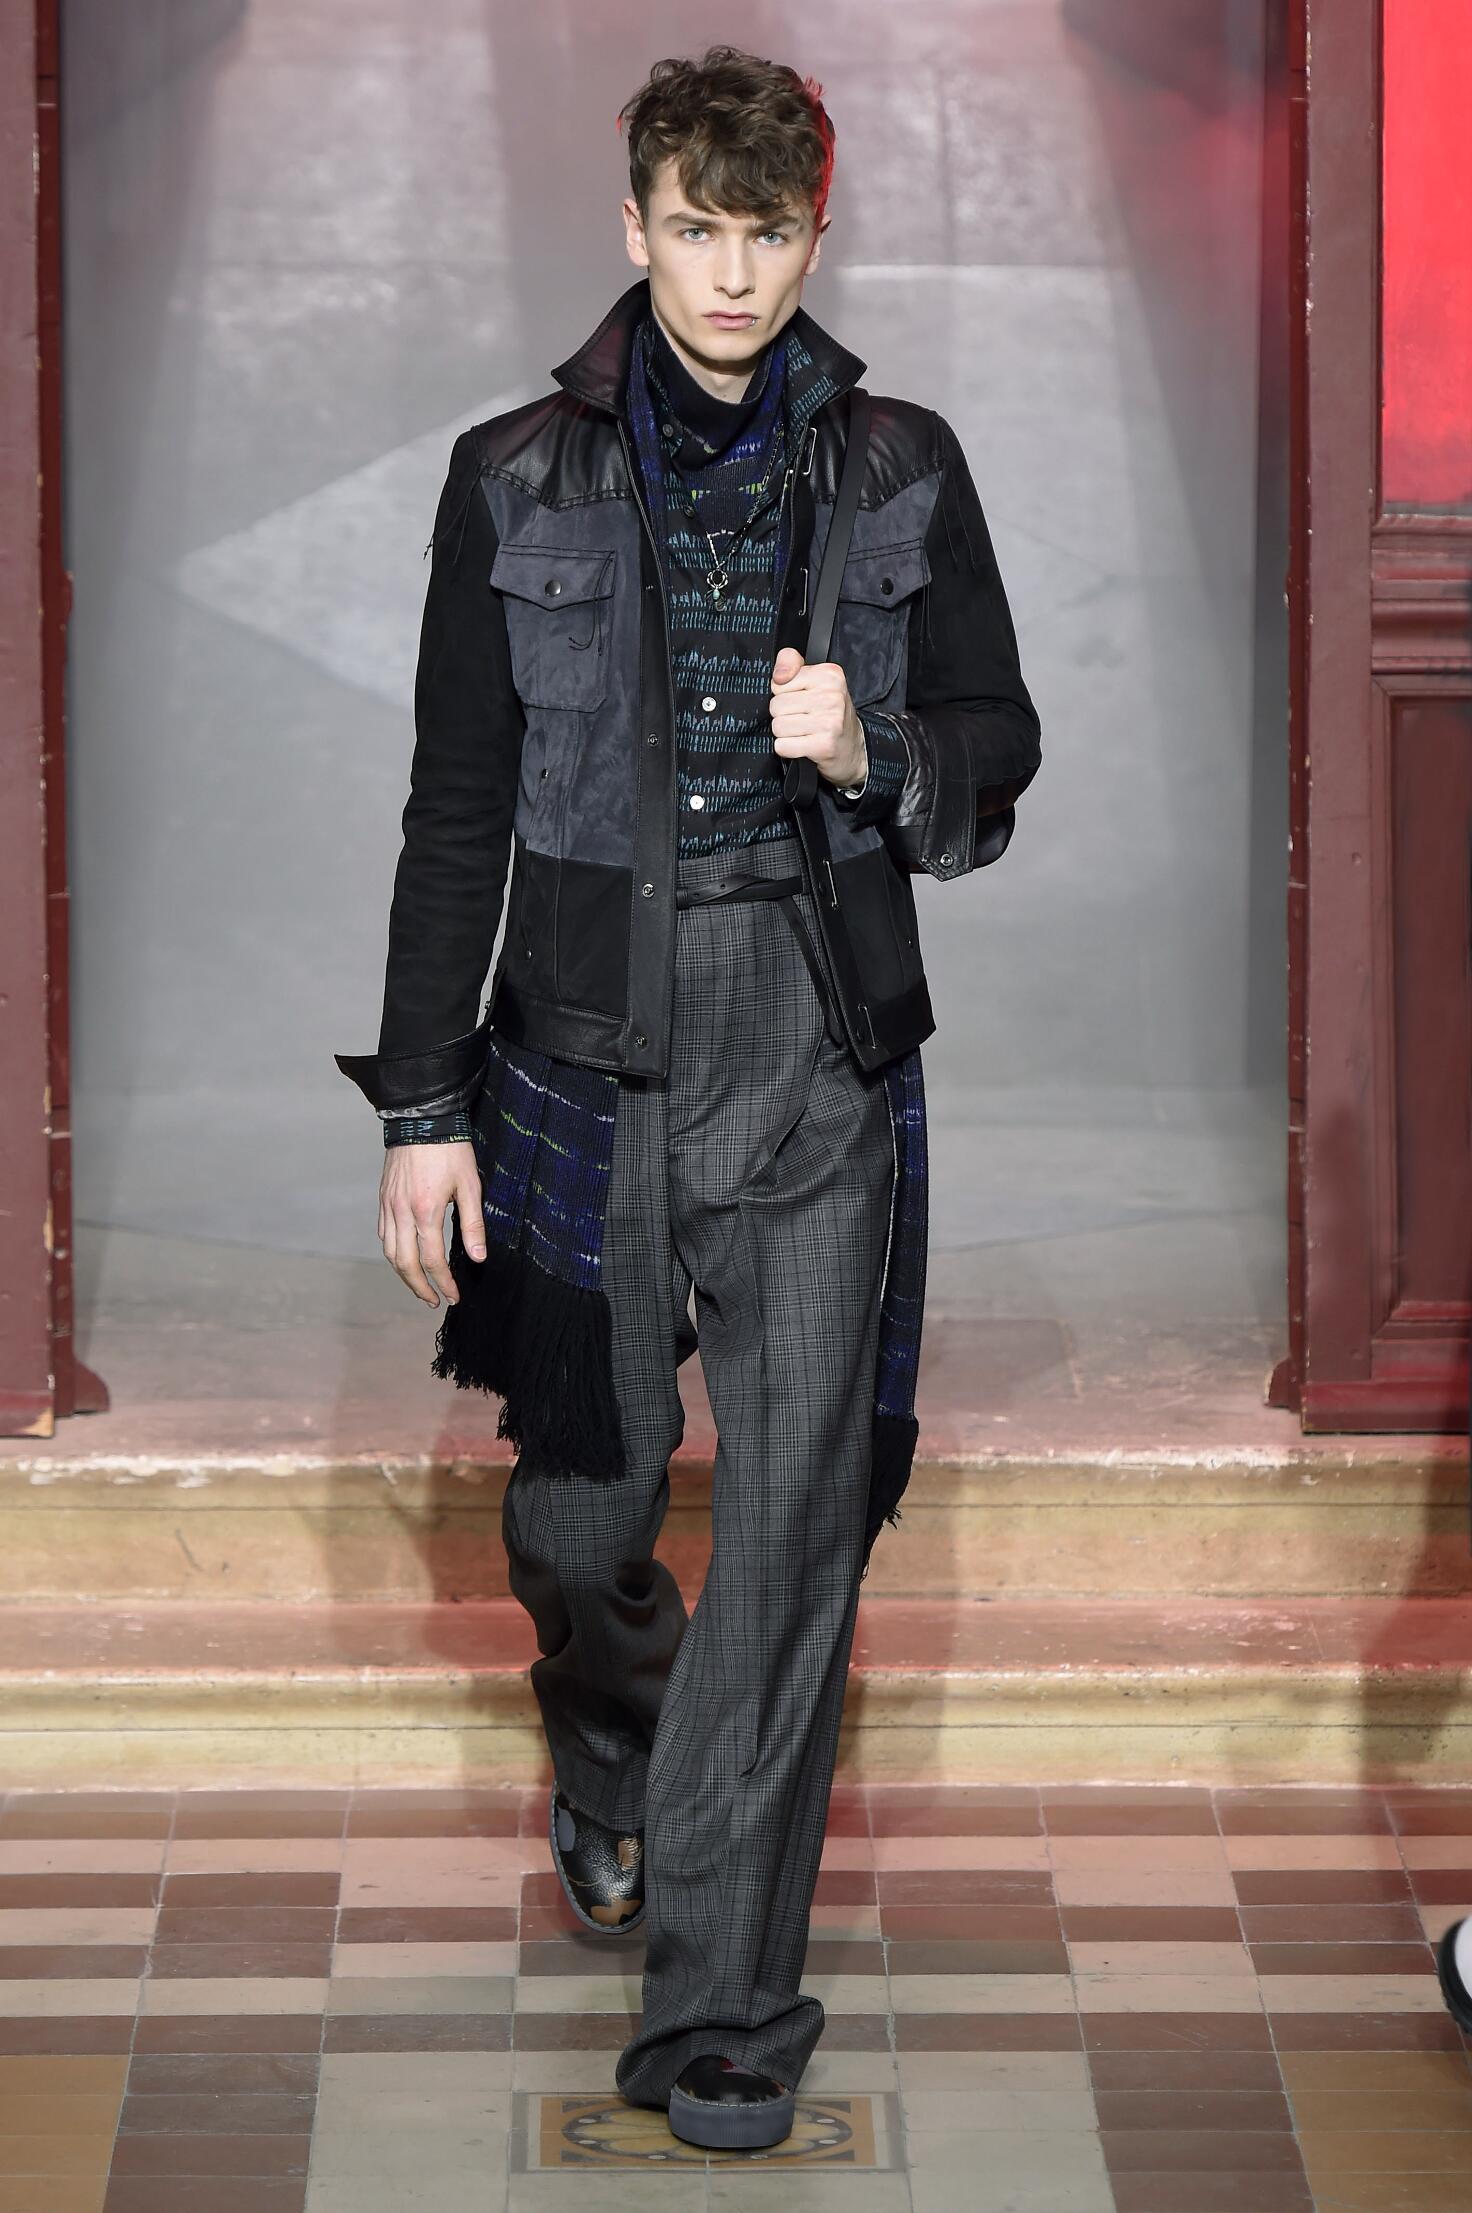 Fashion Man Model Lanvin Collection Catwalk